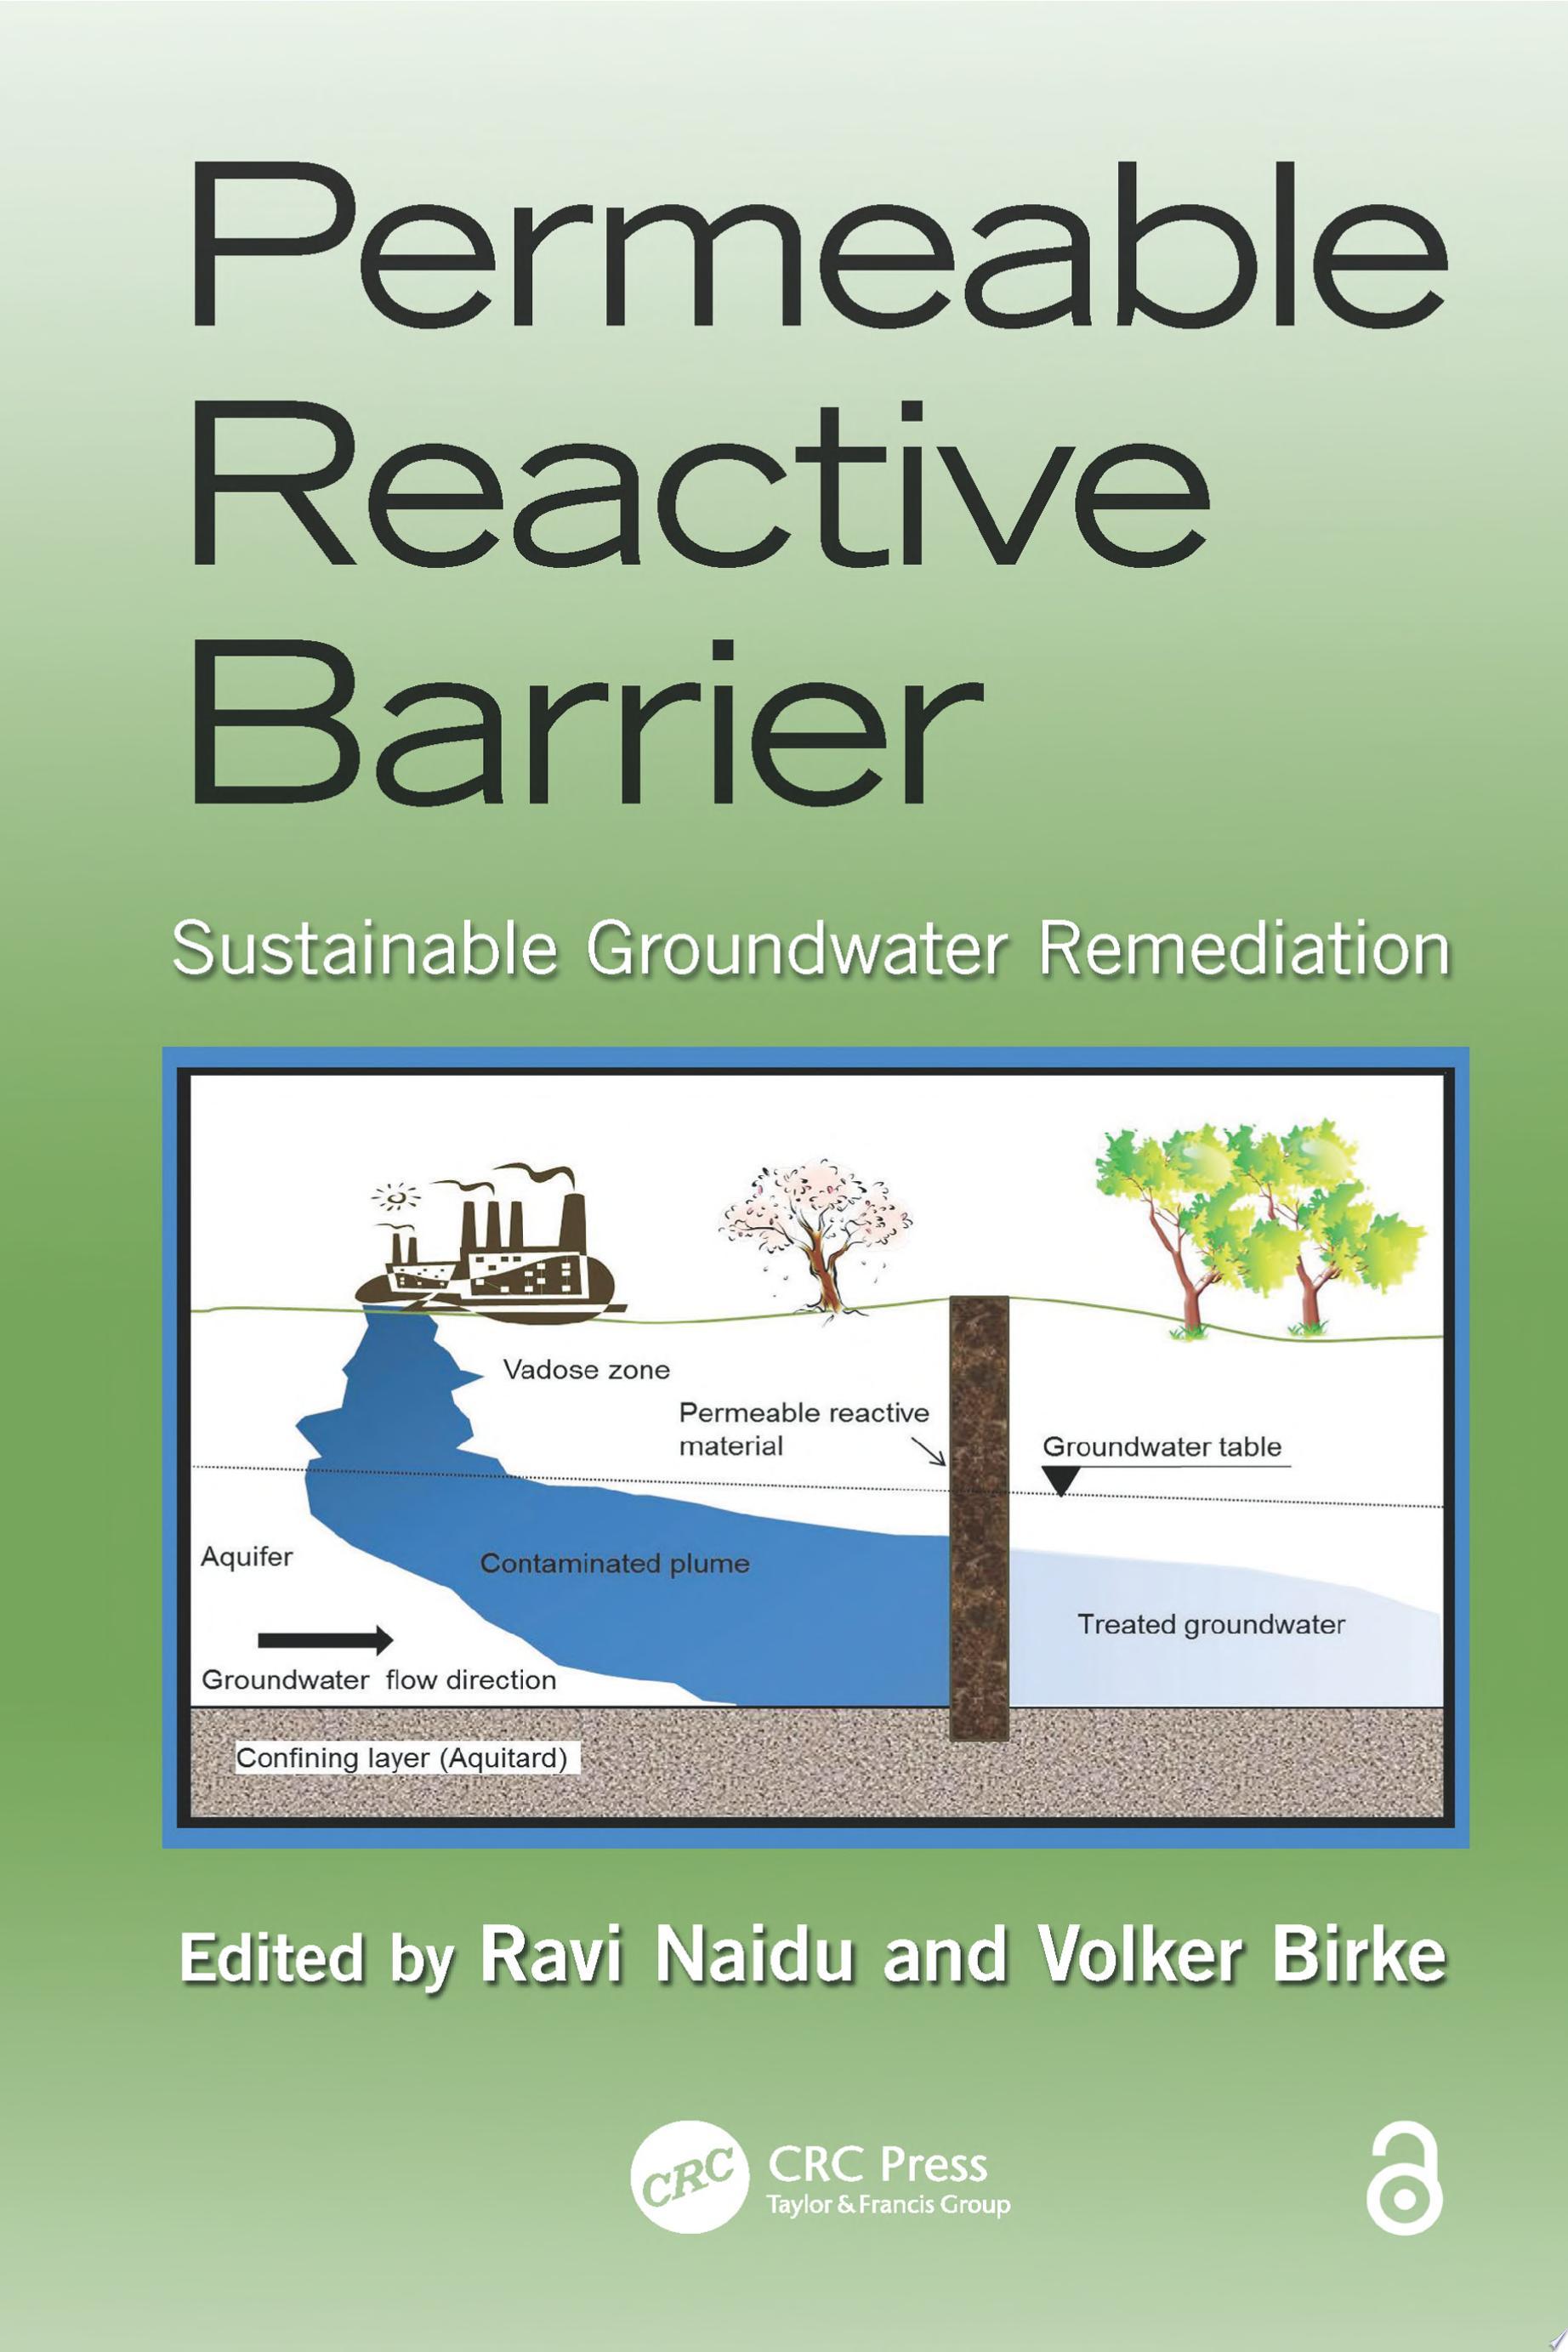 Permeable Reactive Barrier